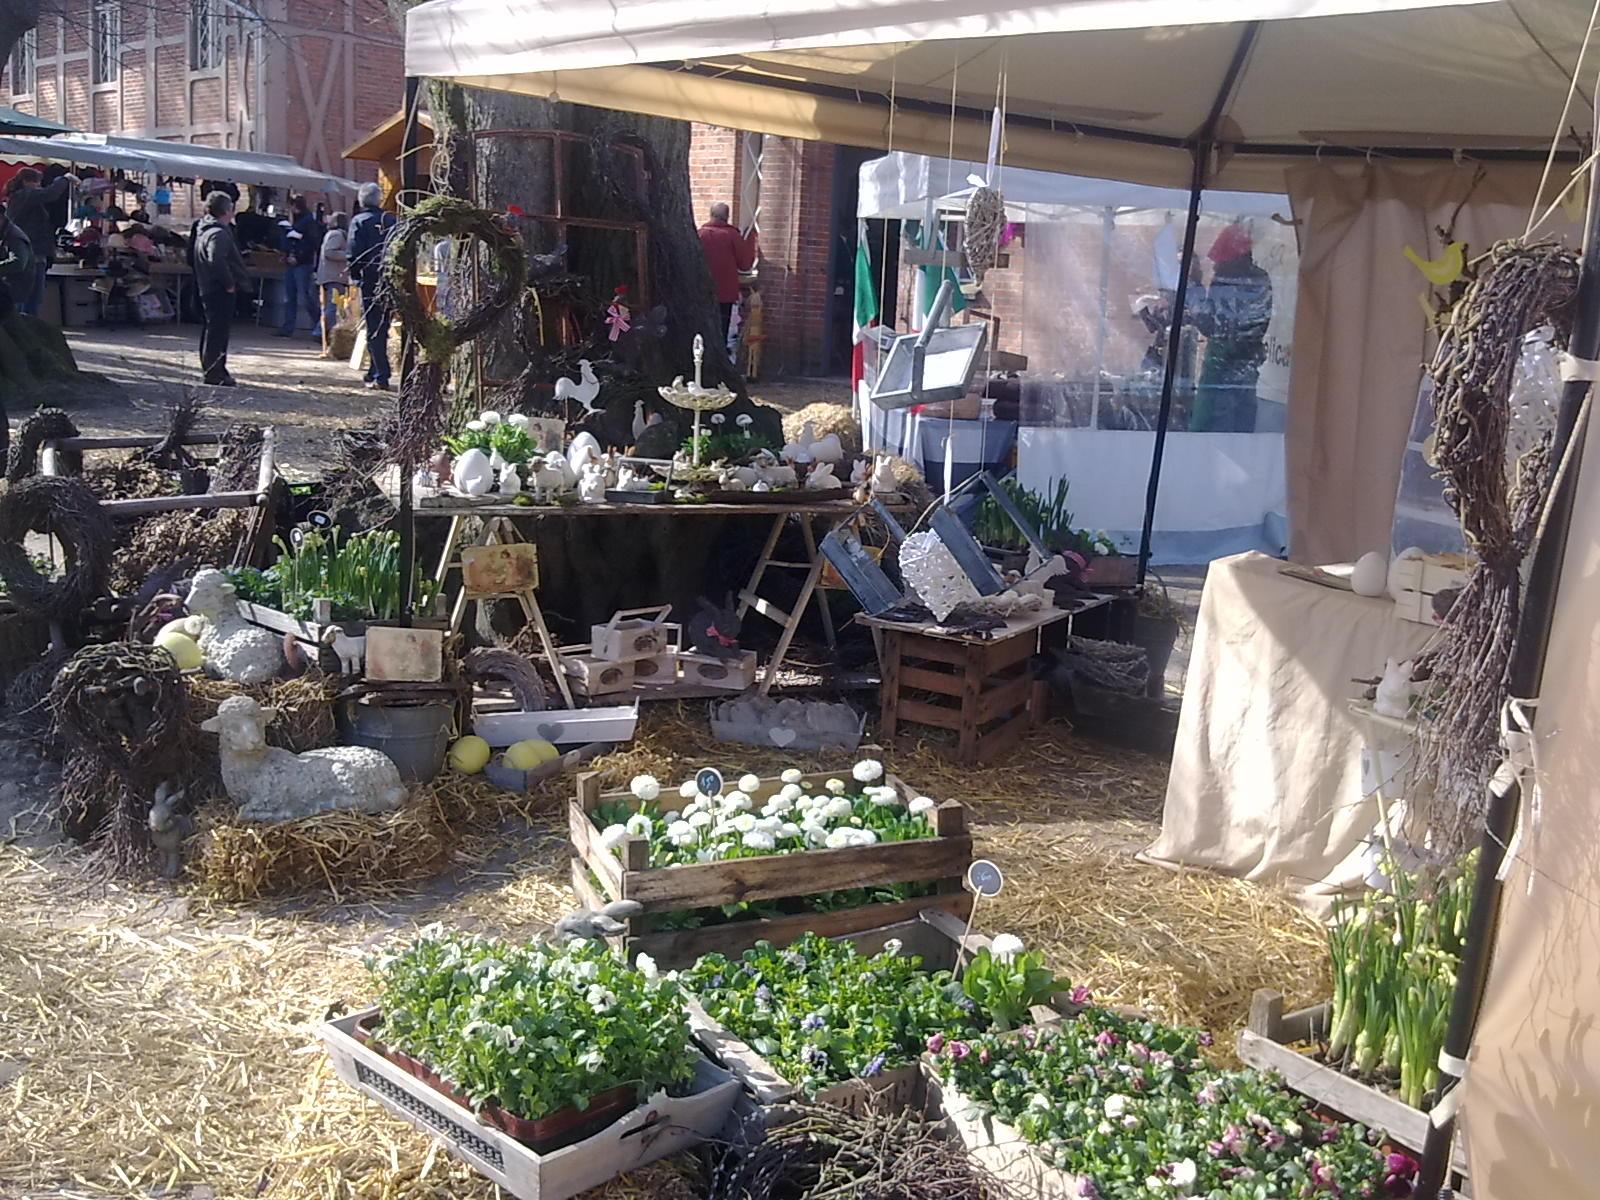 gartendeko selbstgemacht holz | siteminsk, Gartenarbeit ideen